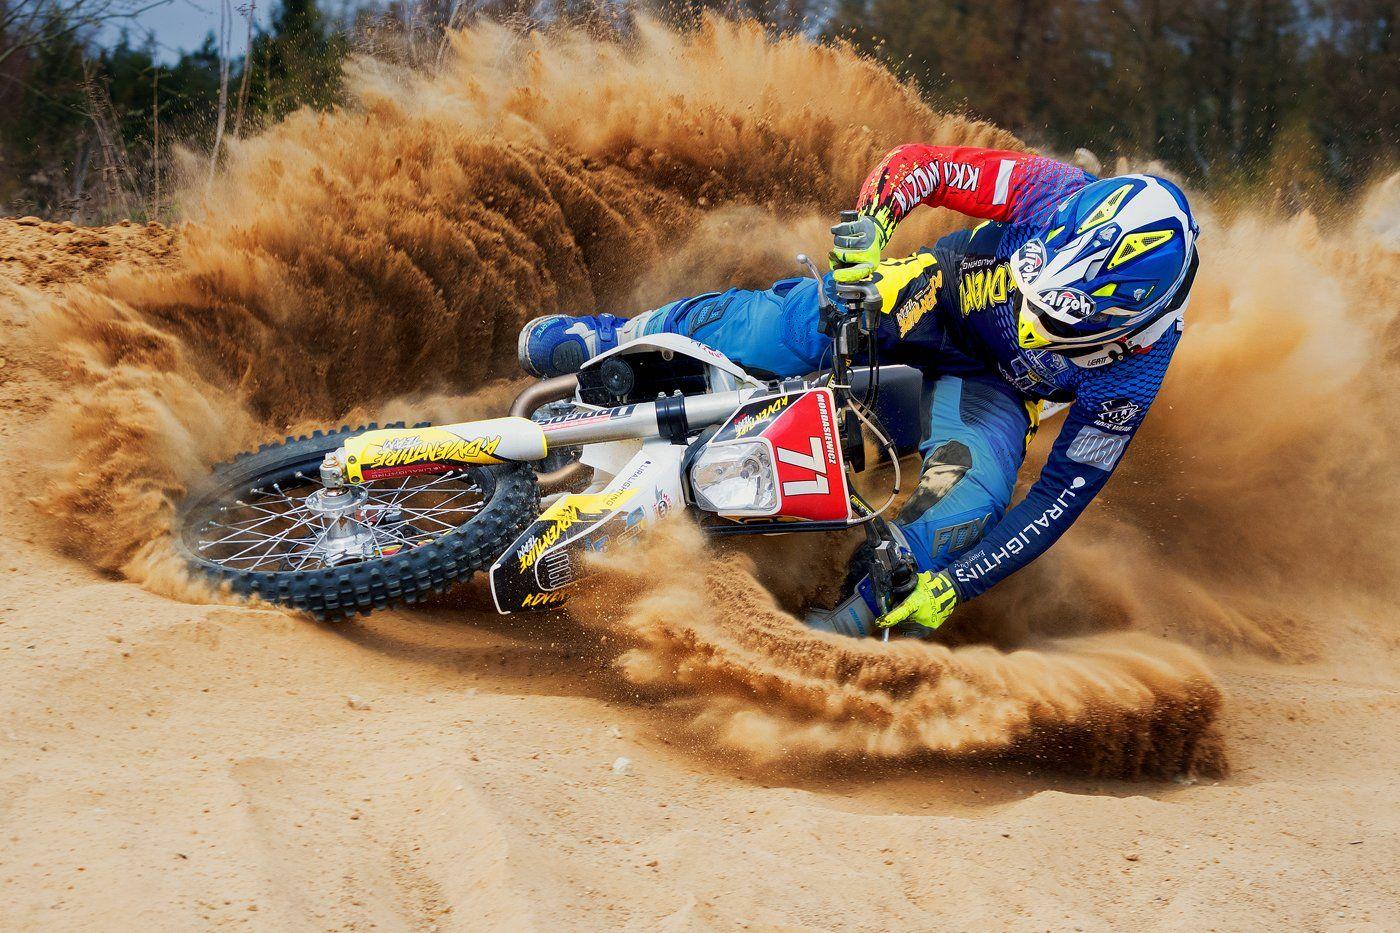 motocross cross adrenaline sport motorsport rider, Paweł  Bożek